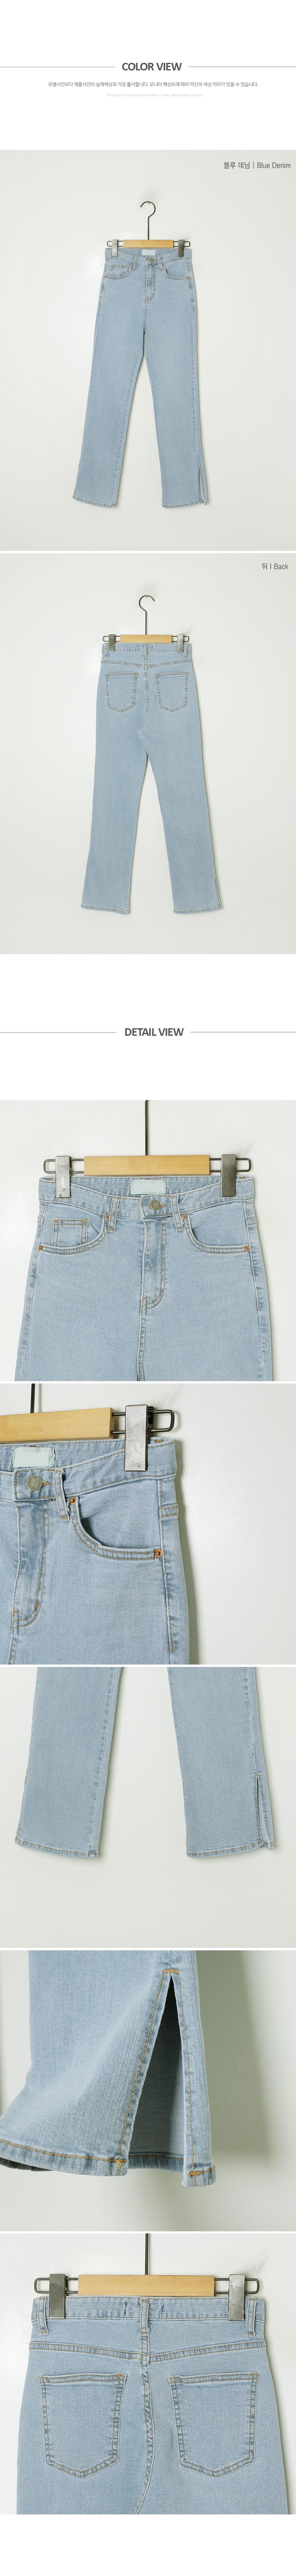 Lined denim pants